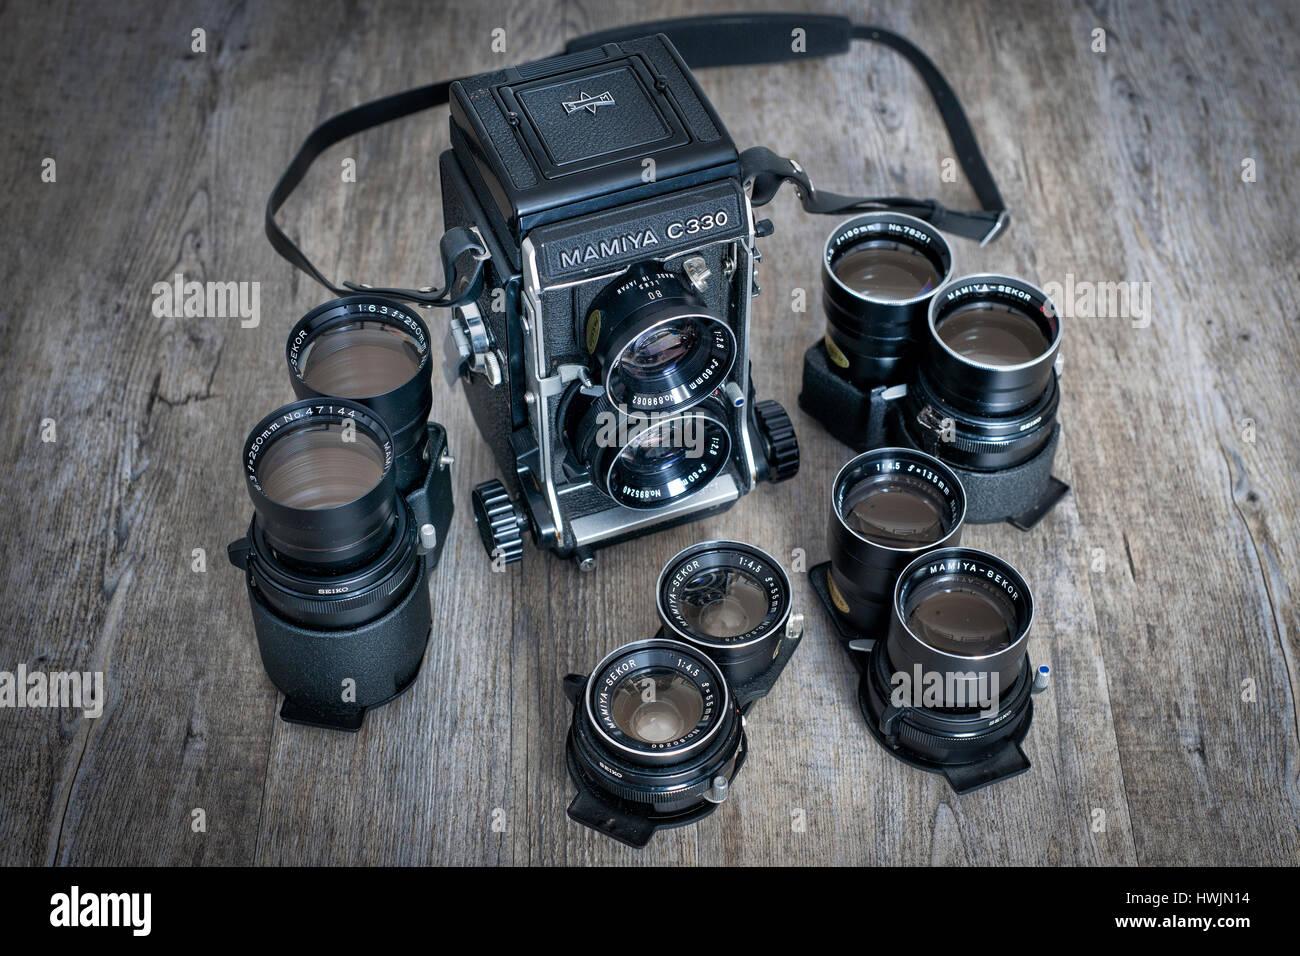 Mamiya C330 medium format twin lens roll film camera with interchangable lenses. Stock Photo